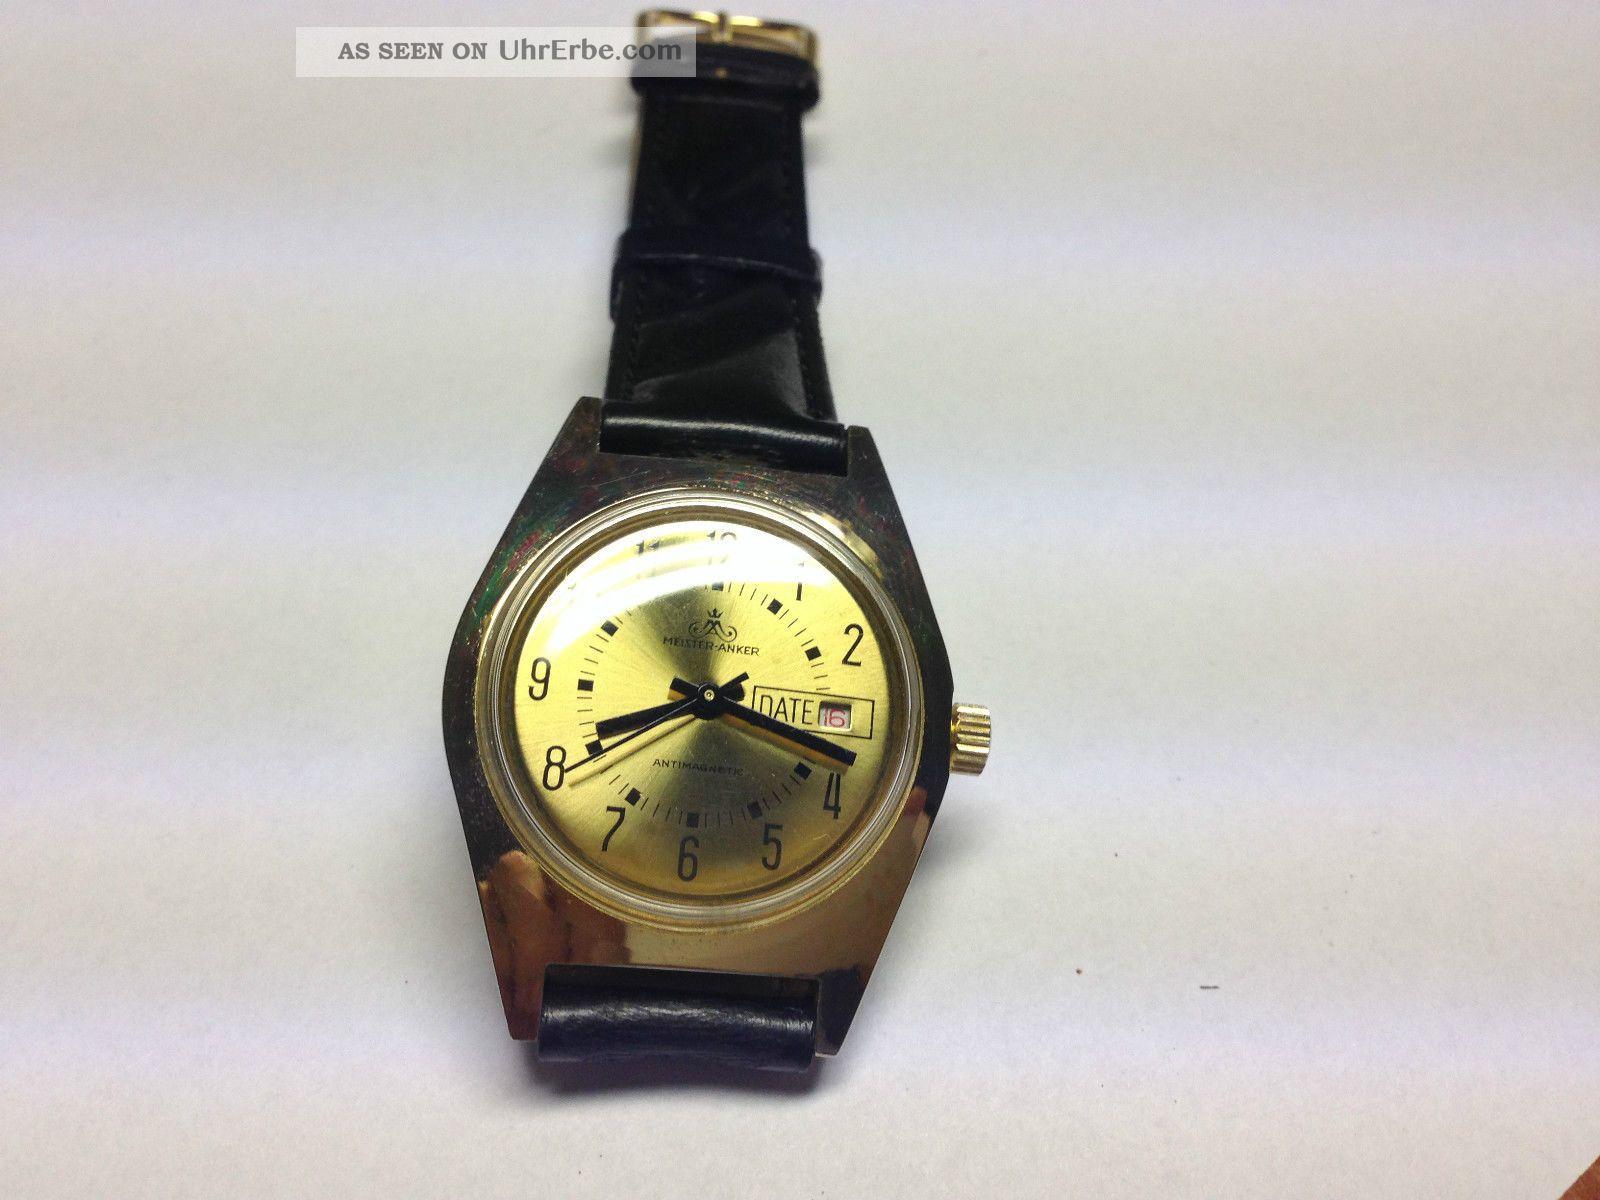 Meister Anker Herren Armband Uhr,  Handaufzug,  Top (2) Armbanduhren Bild